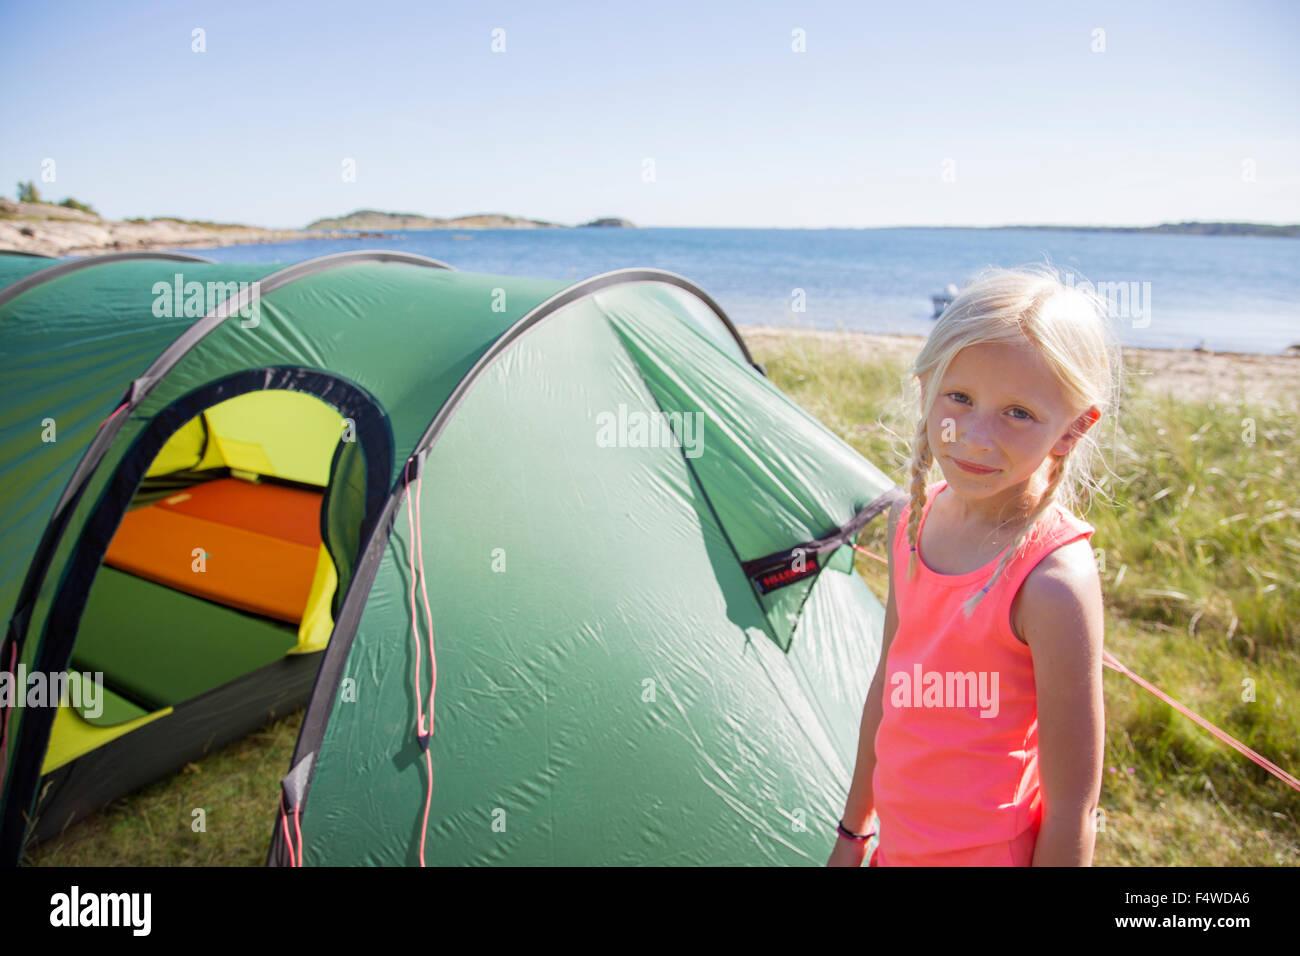 Sweden, Swedish West Coast, Halland, Kungsbackafjorden, Girl (10-11) standing in front of tent - Stock Image